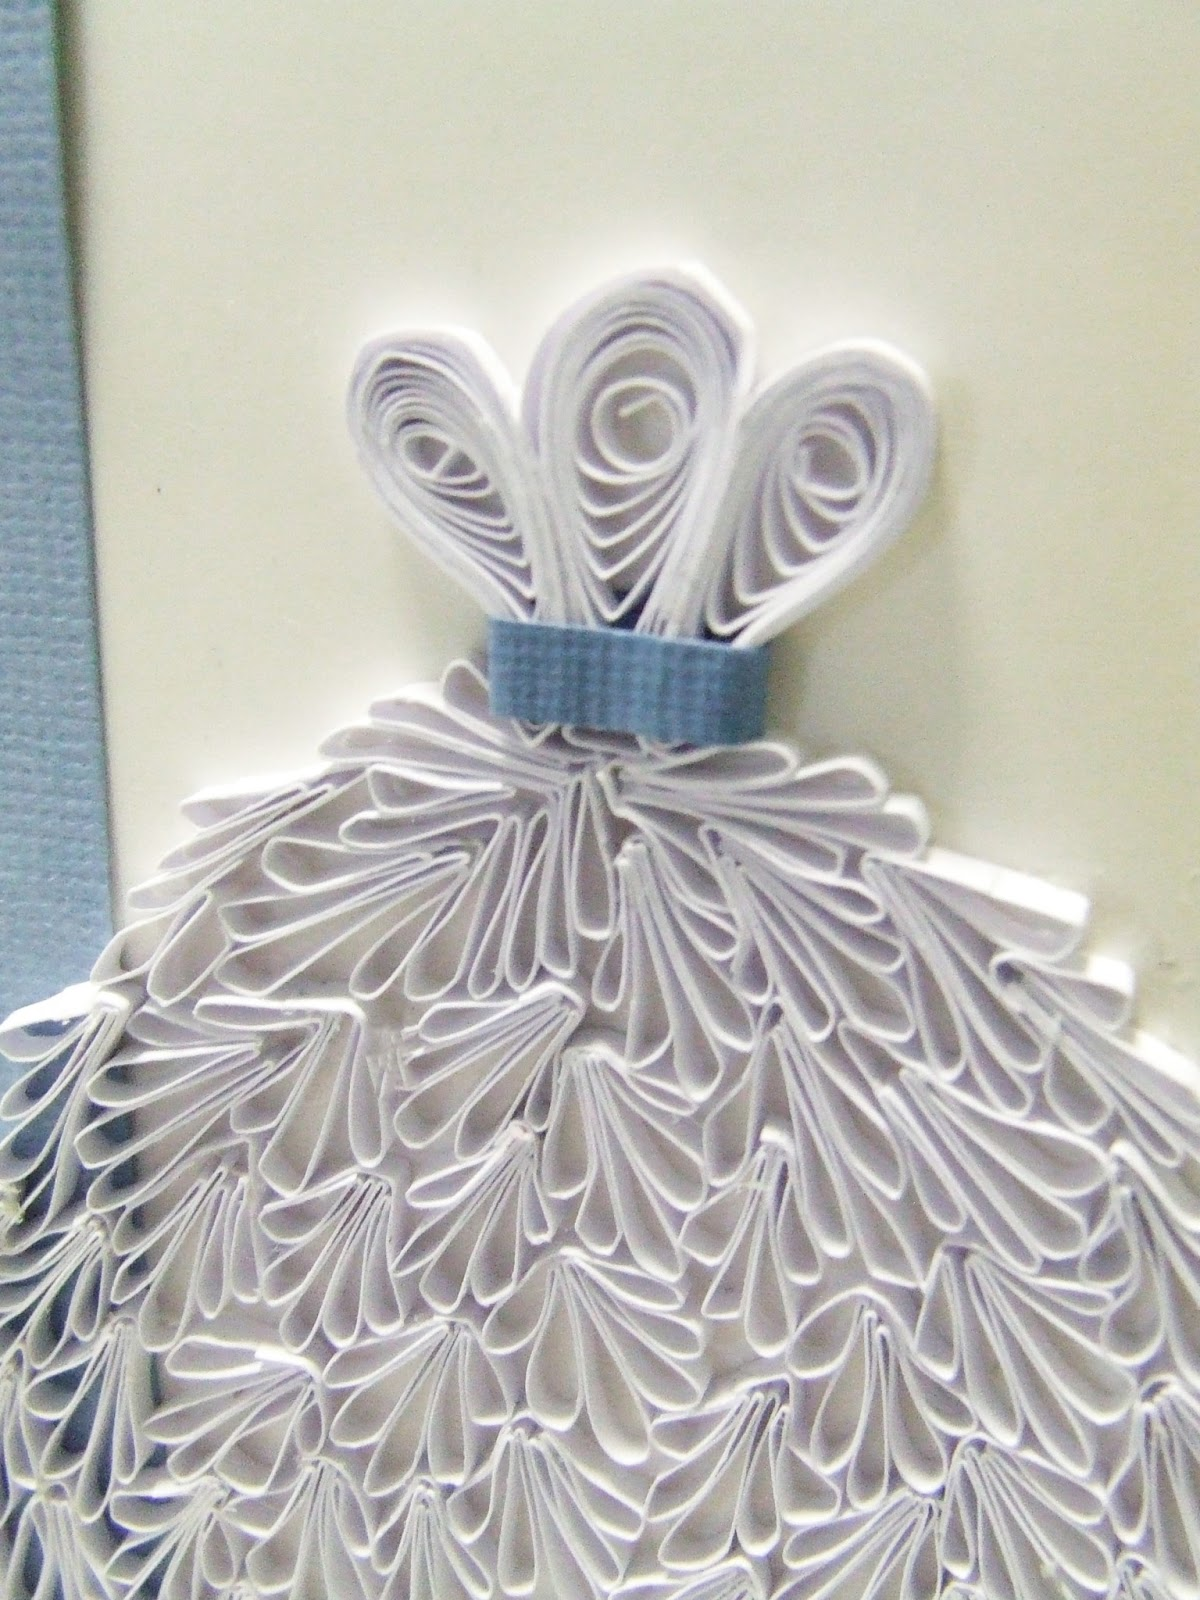 Polka Dot Parasol Designs: Week Thirty-Three: Bridal Gowns